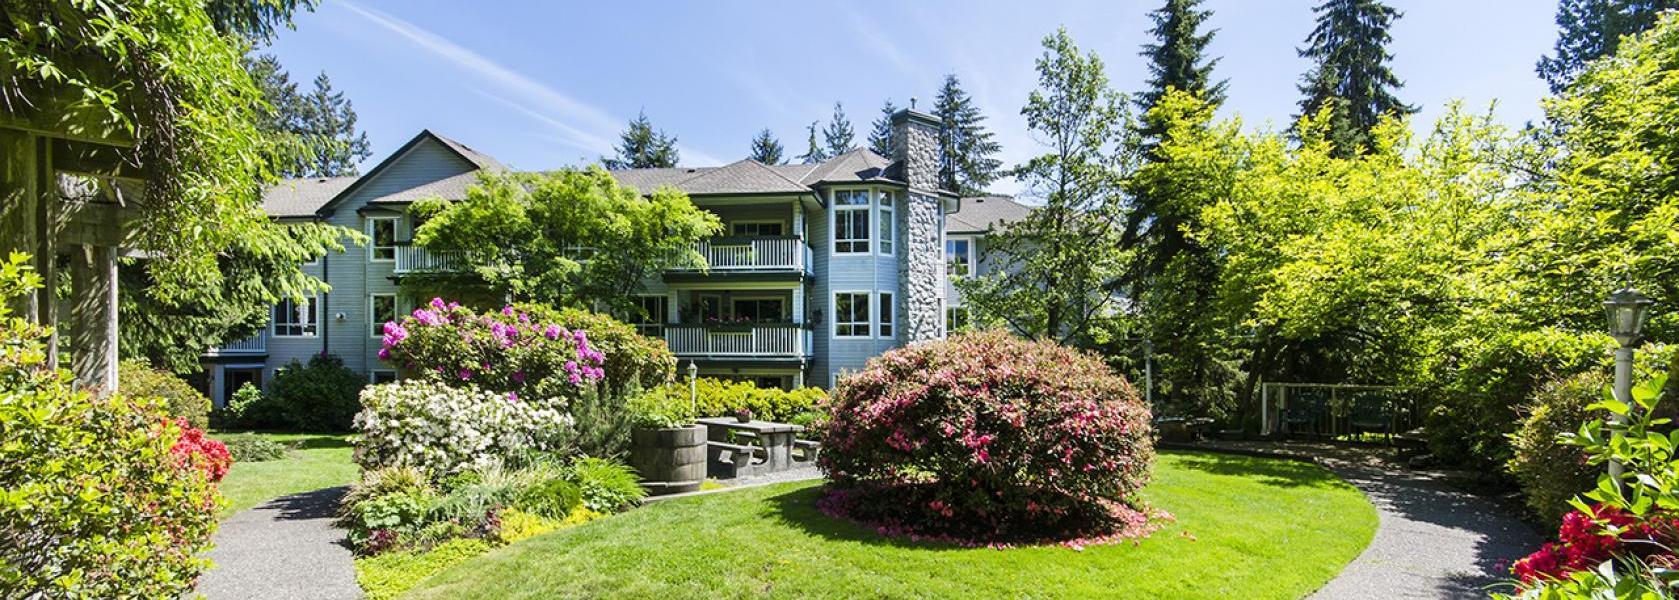 106 - 1150 Lynn Valley Road, Lynn Valley, North Vancouver